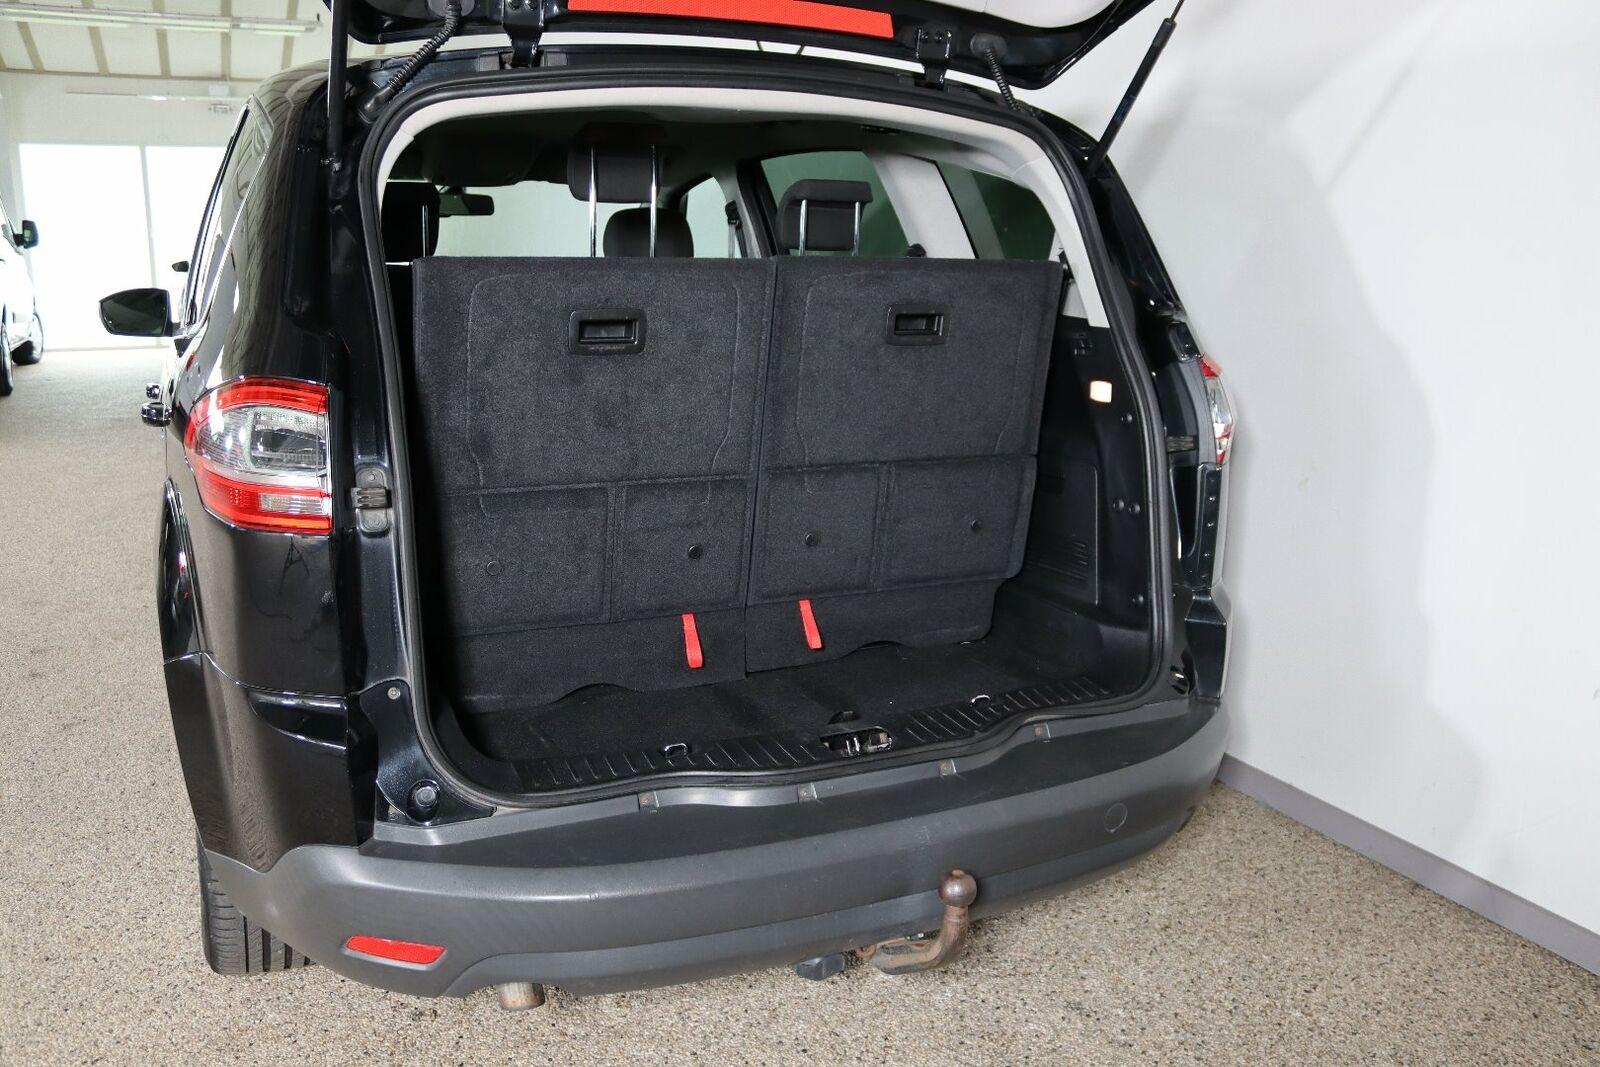 Ford S-MAX 2,0 TDCi 163 Titanium aut. 7prs - billede 5